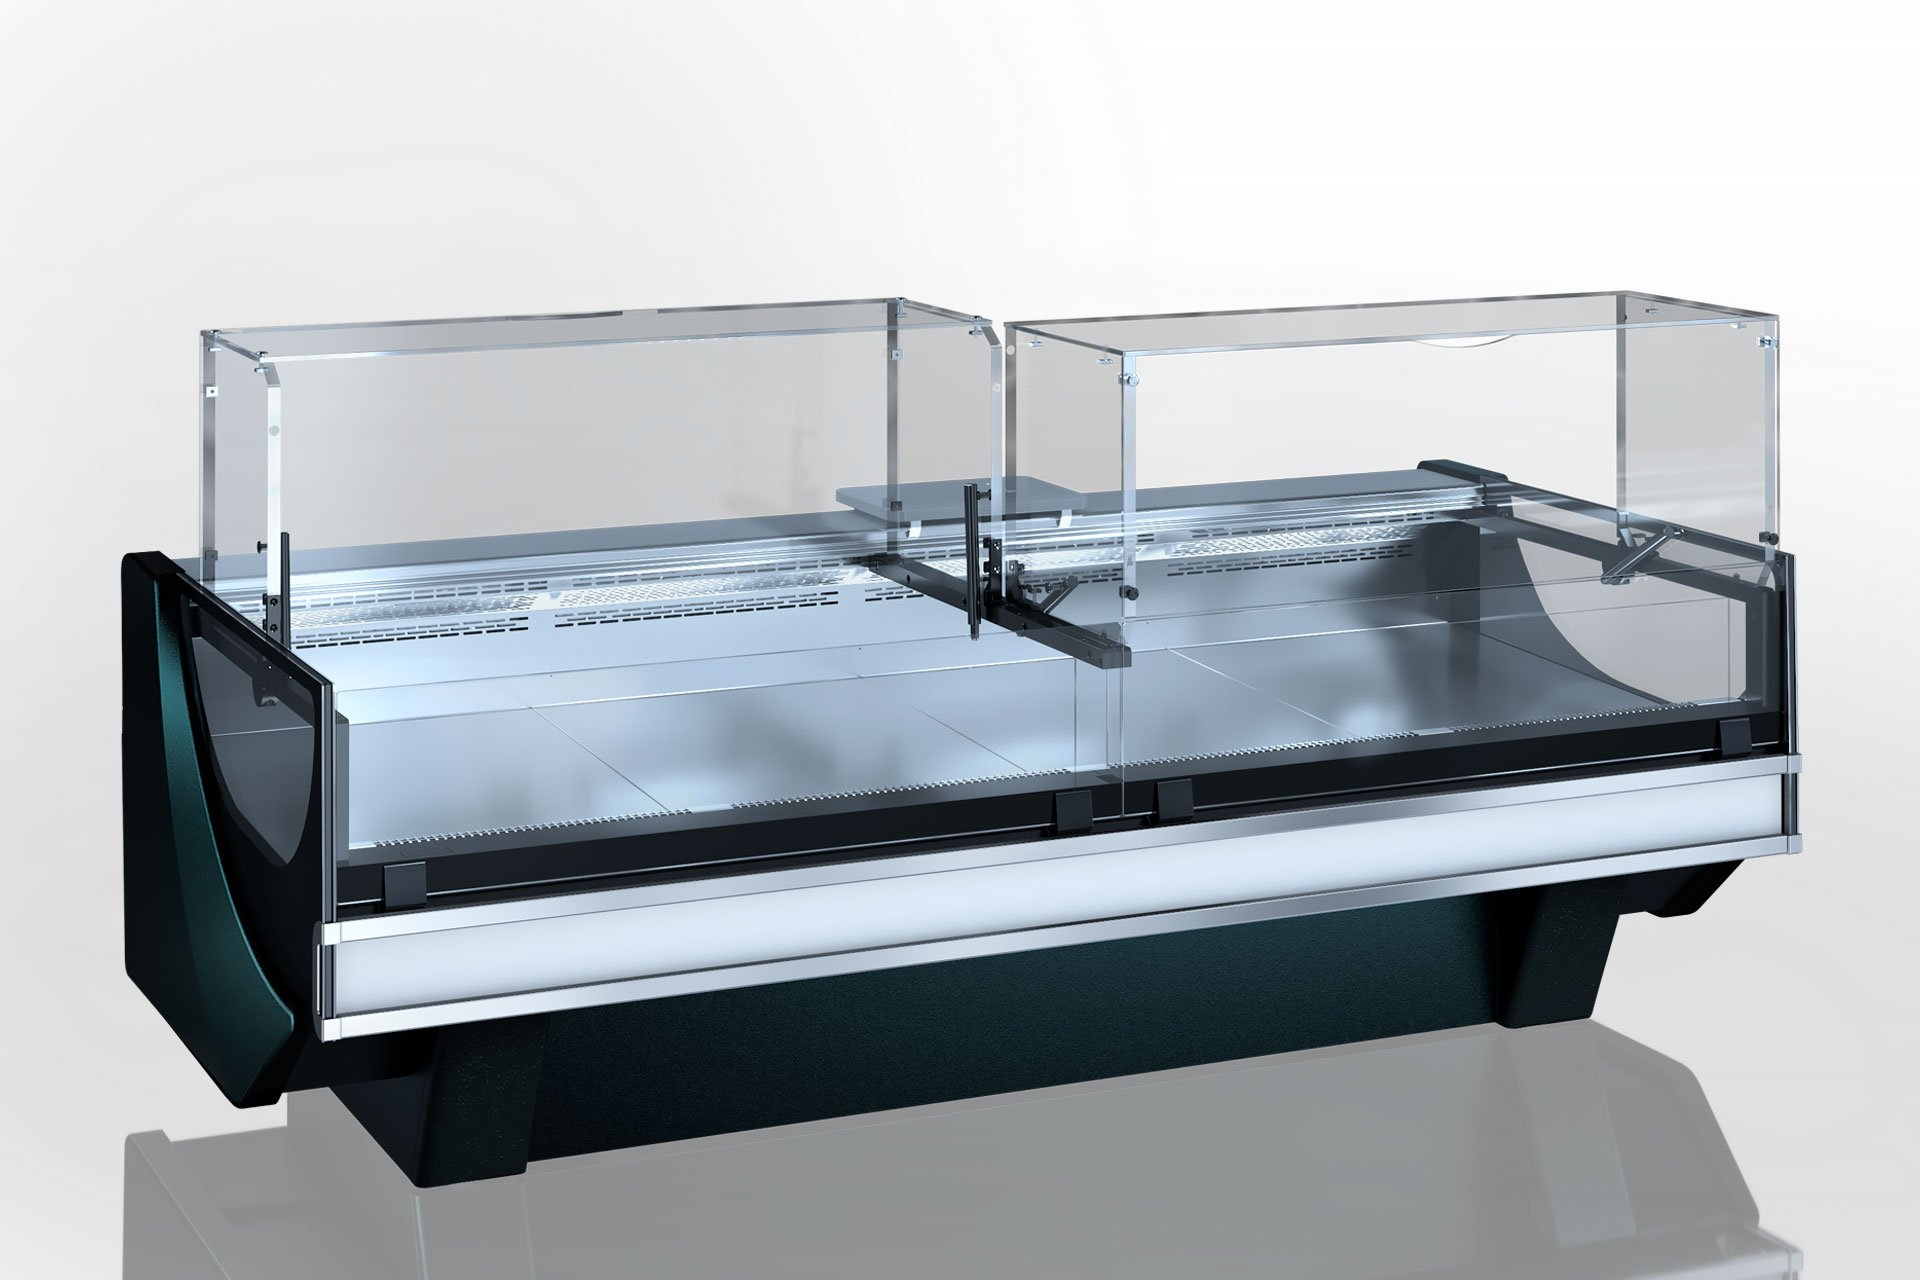 מקרר ויטרינה MISSOURI COLD DIAMOND MC 125 DELI CONVERTIBLE M